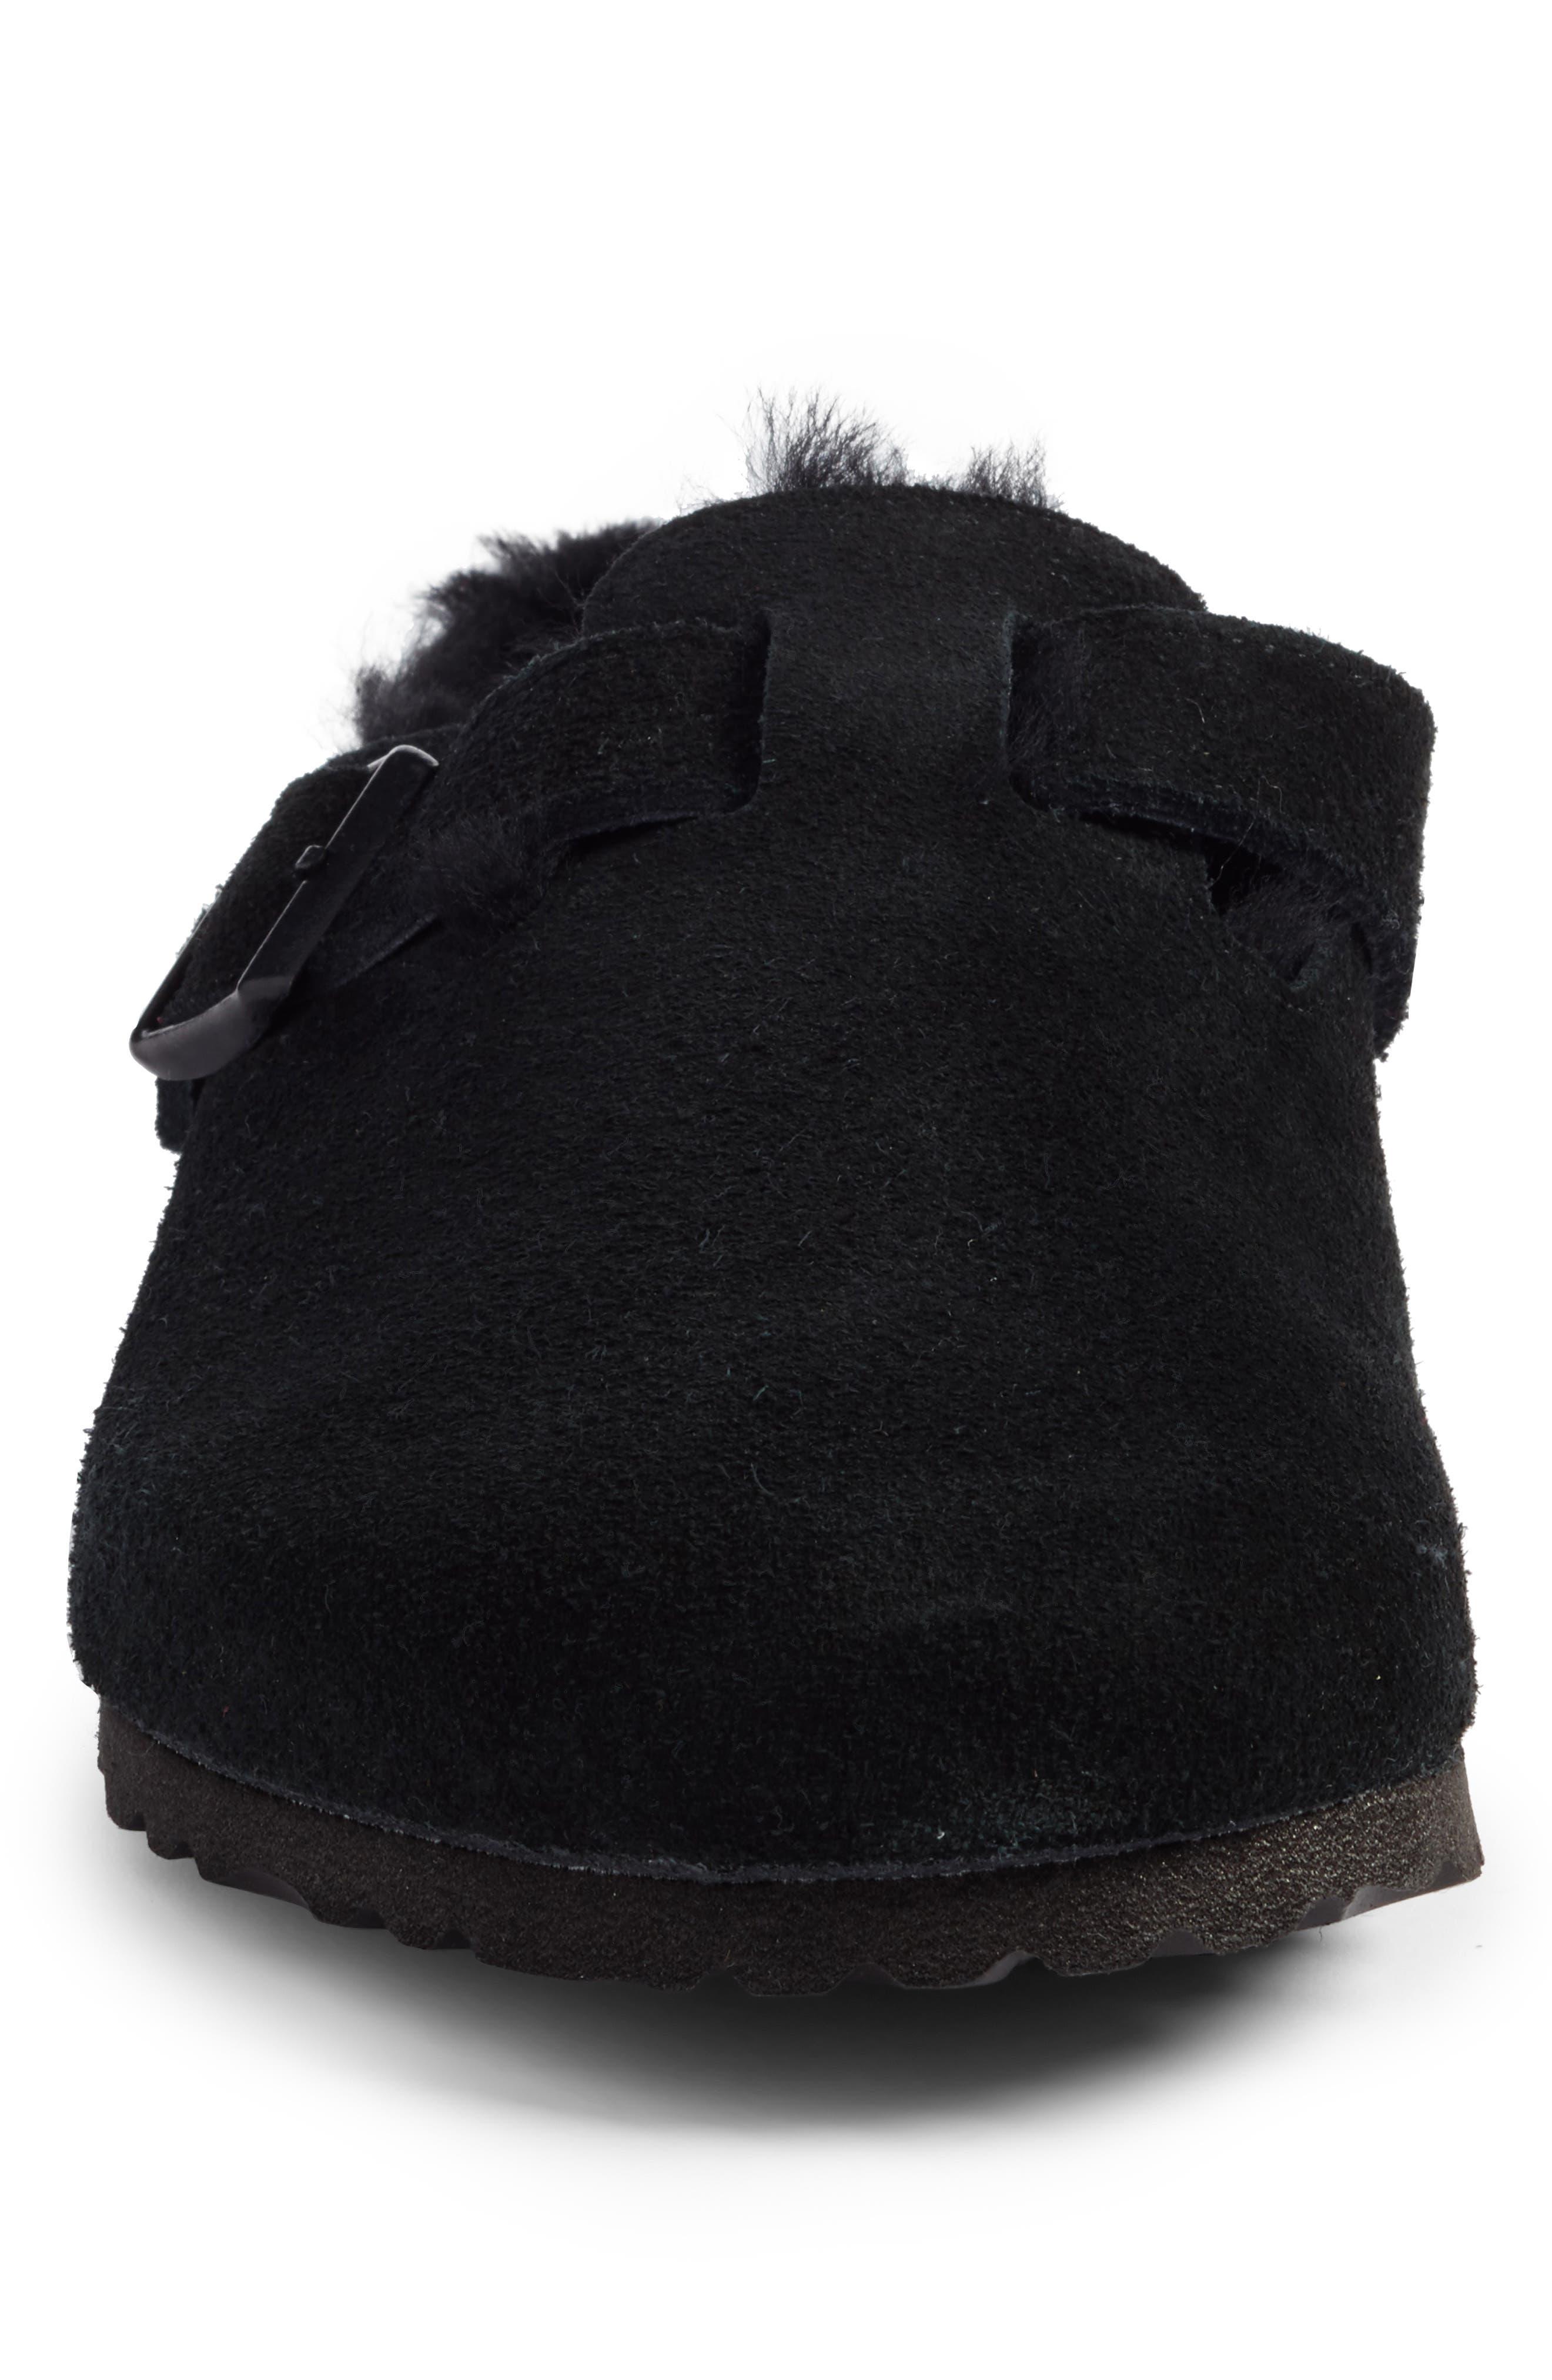 Boston Genuine Shearling Lined Clog,                             Alternate thumbnail 4, color,                             Black/ Black